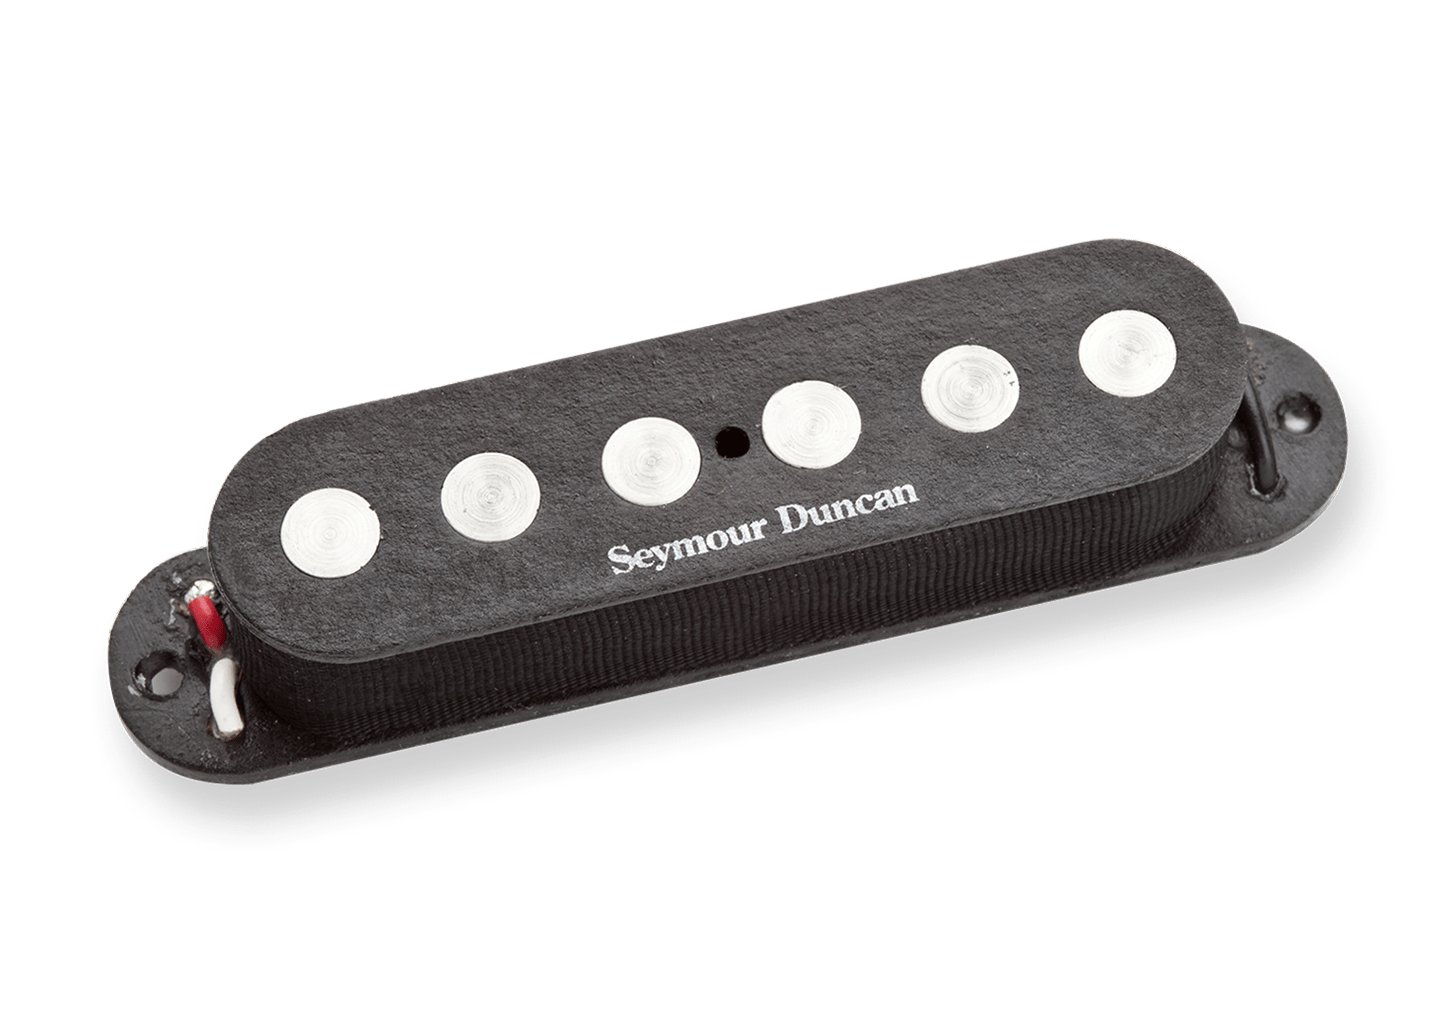 Seymour Duncan Quarter Pound U2122 Strat Pickup